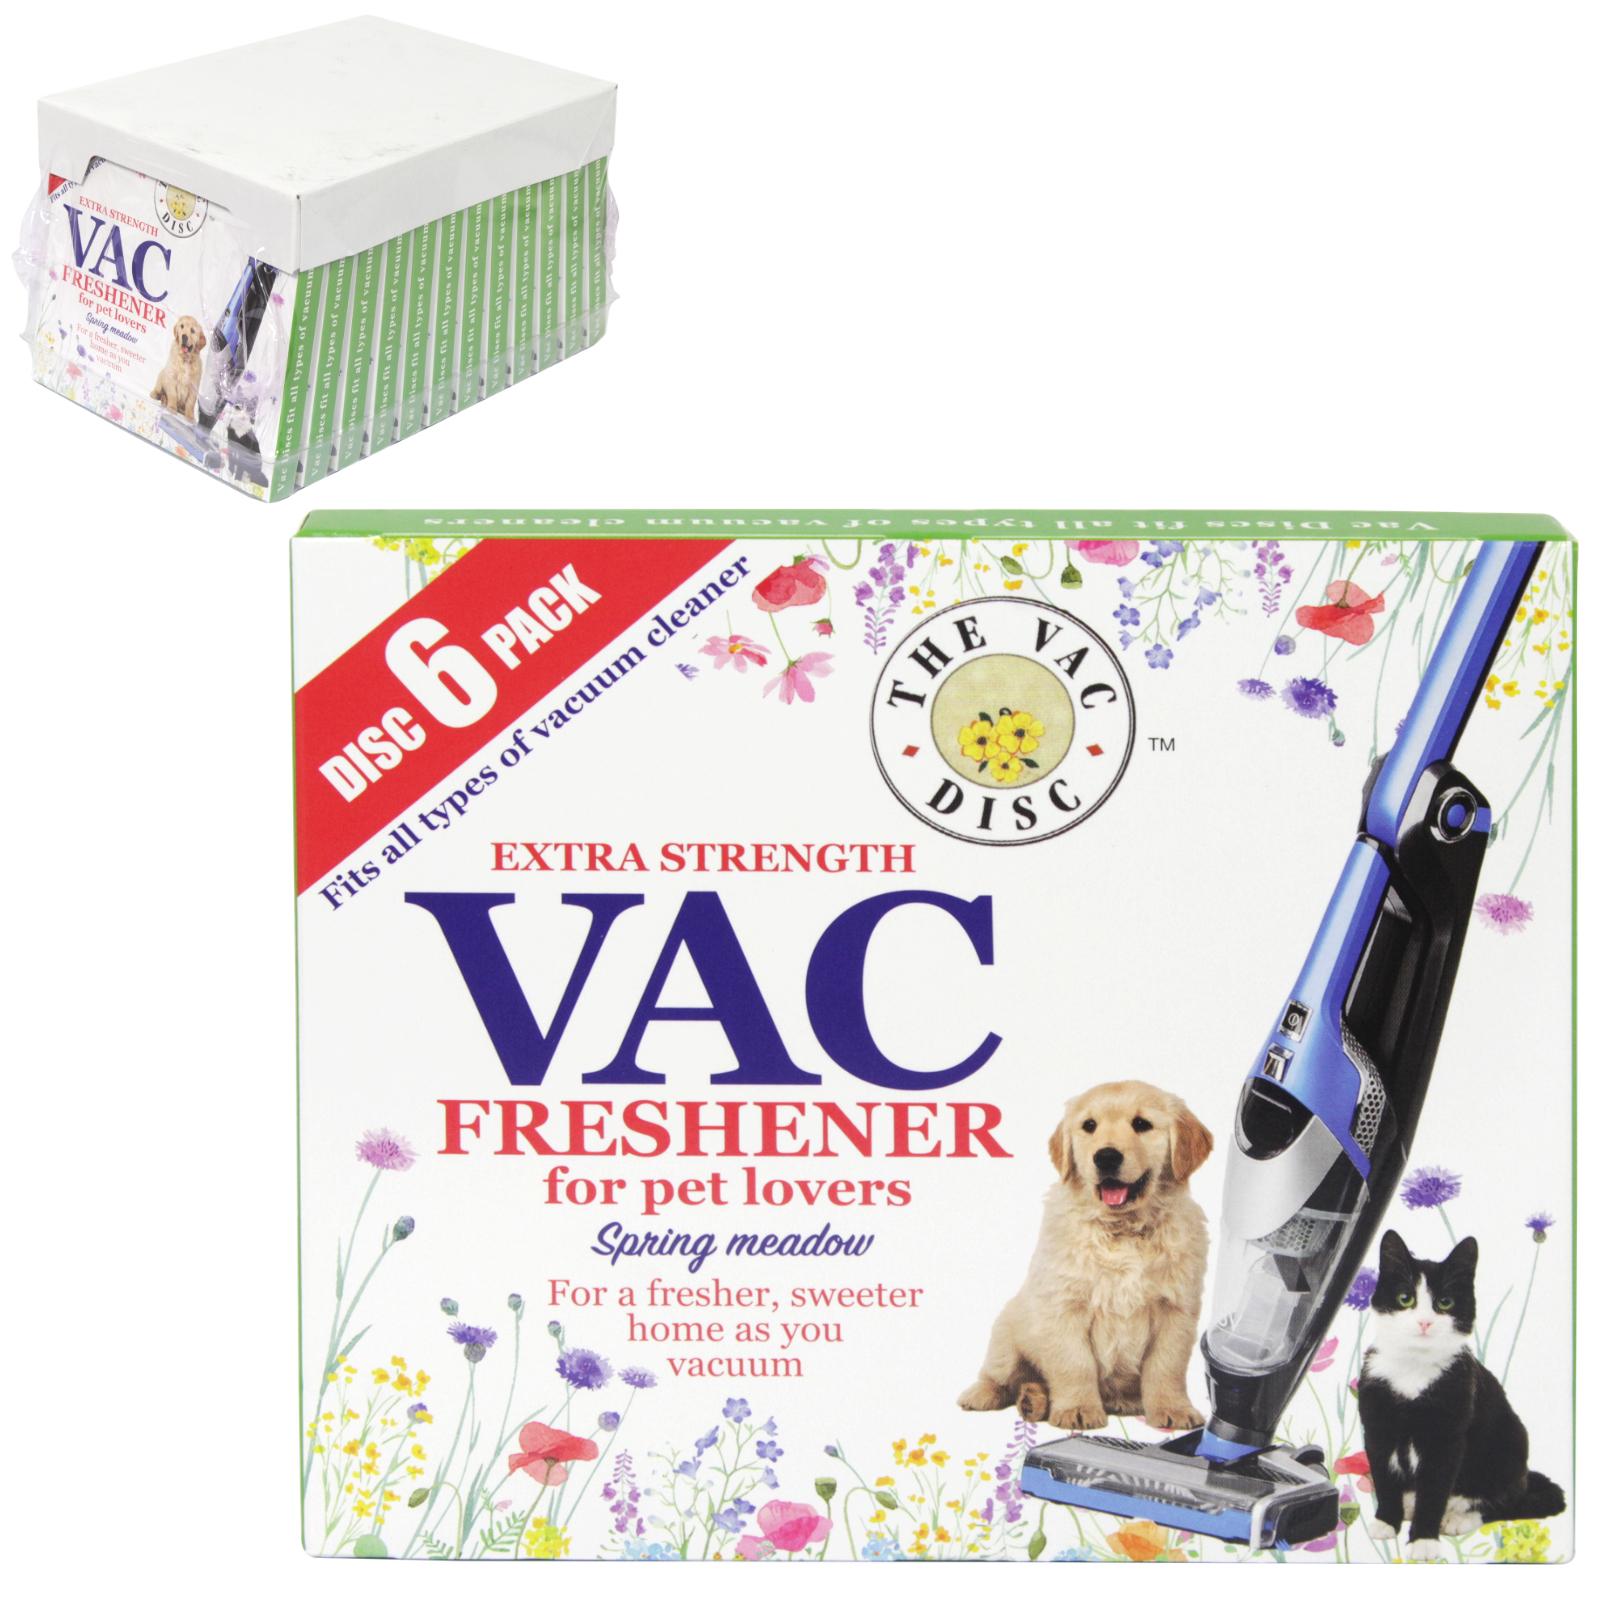 VAC FRESHENER 6PK DISC PET LOVERS X12